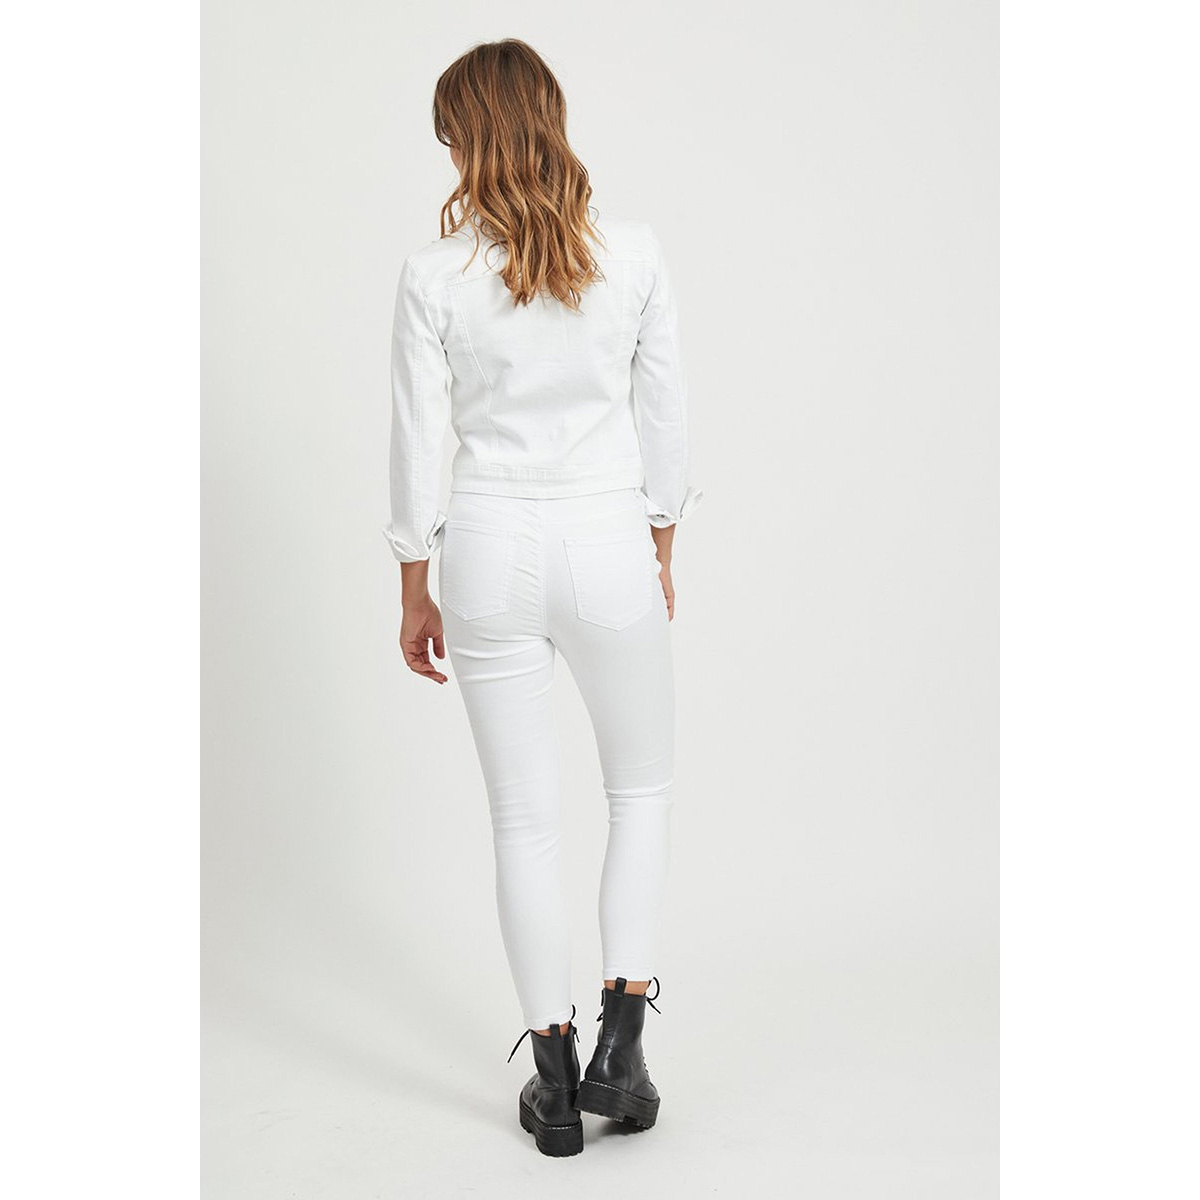 objskinnysophie m/w 7/8 obb308 noos 23031794 object jeans white